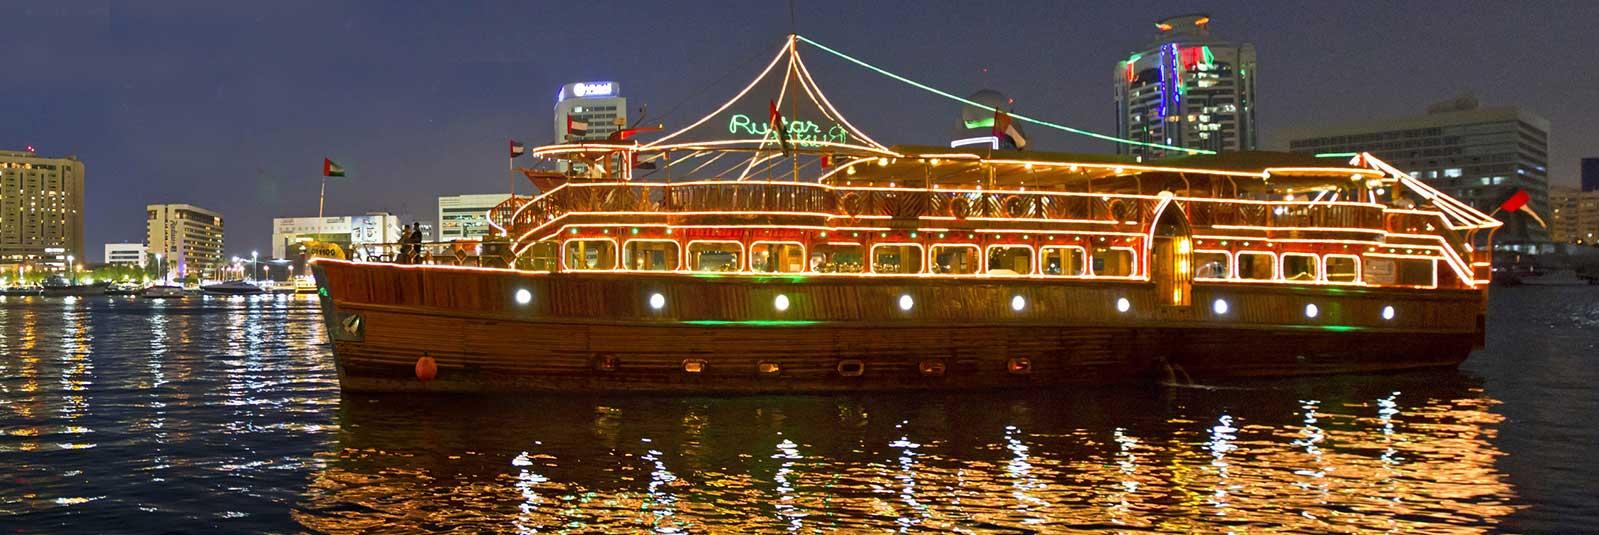 Rustar-Cruise.jpg